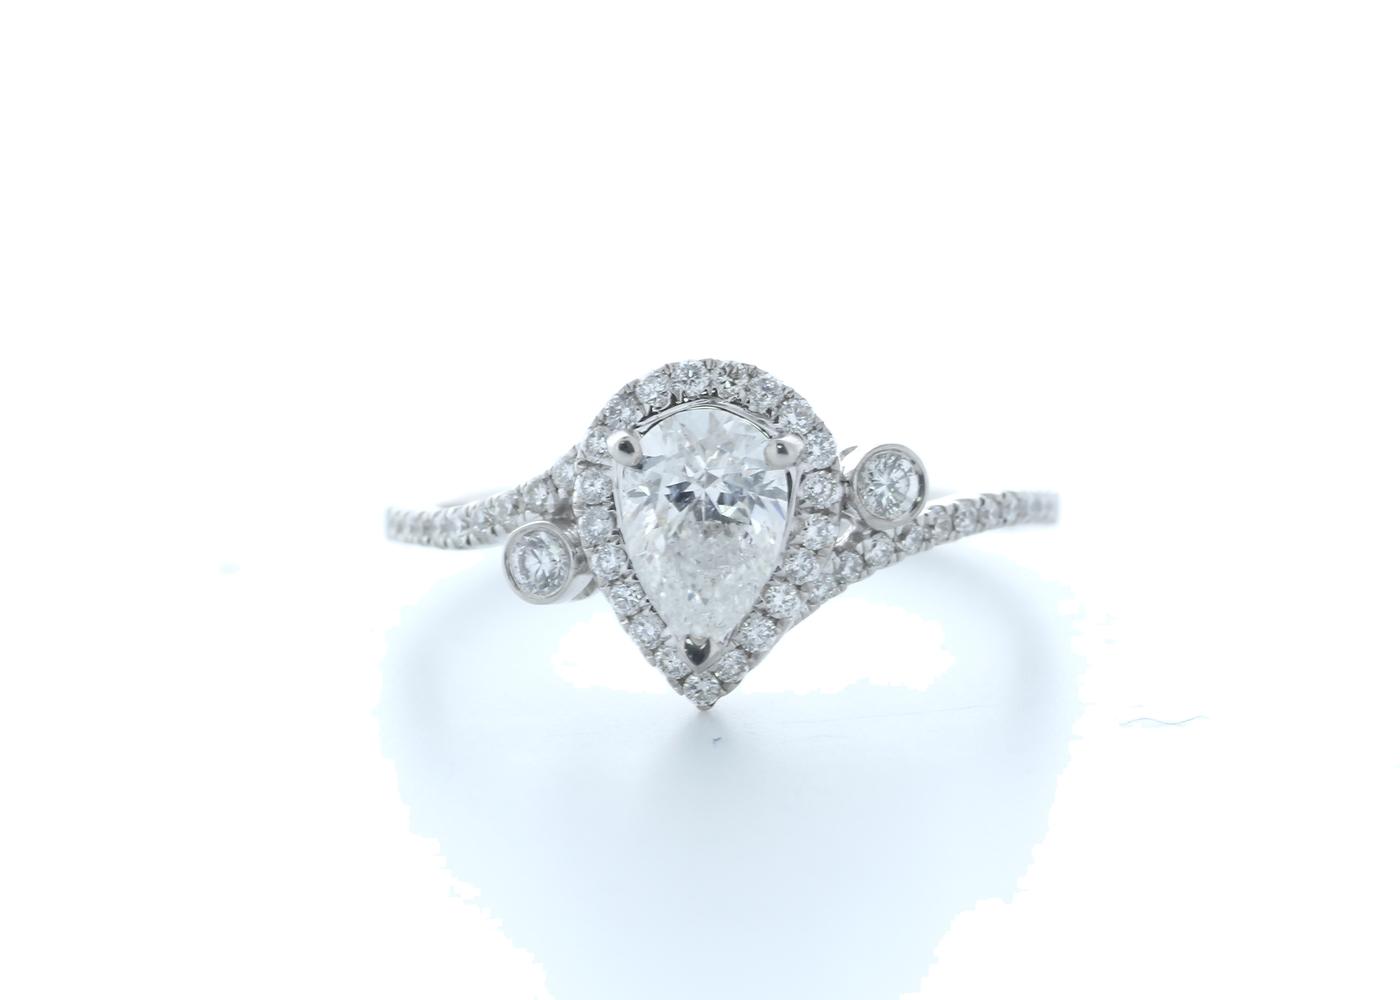 18ct White Gold Pear Shape Halo Diamond Ring 0.76 (0.51) Carats